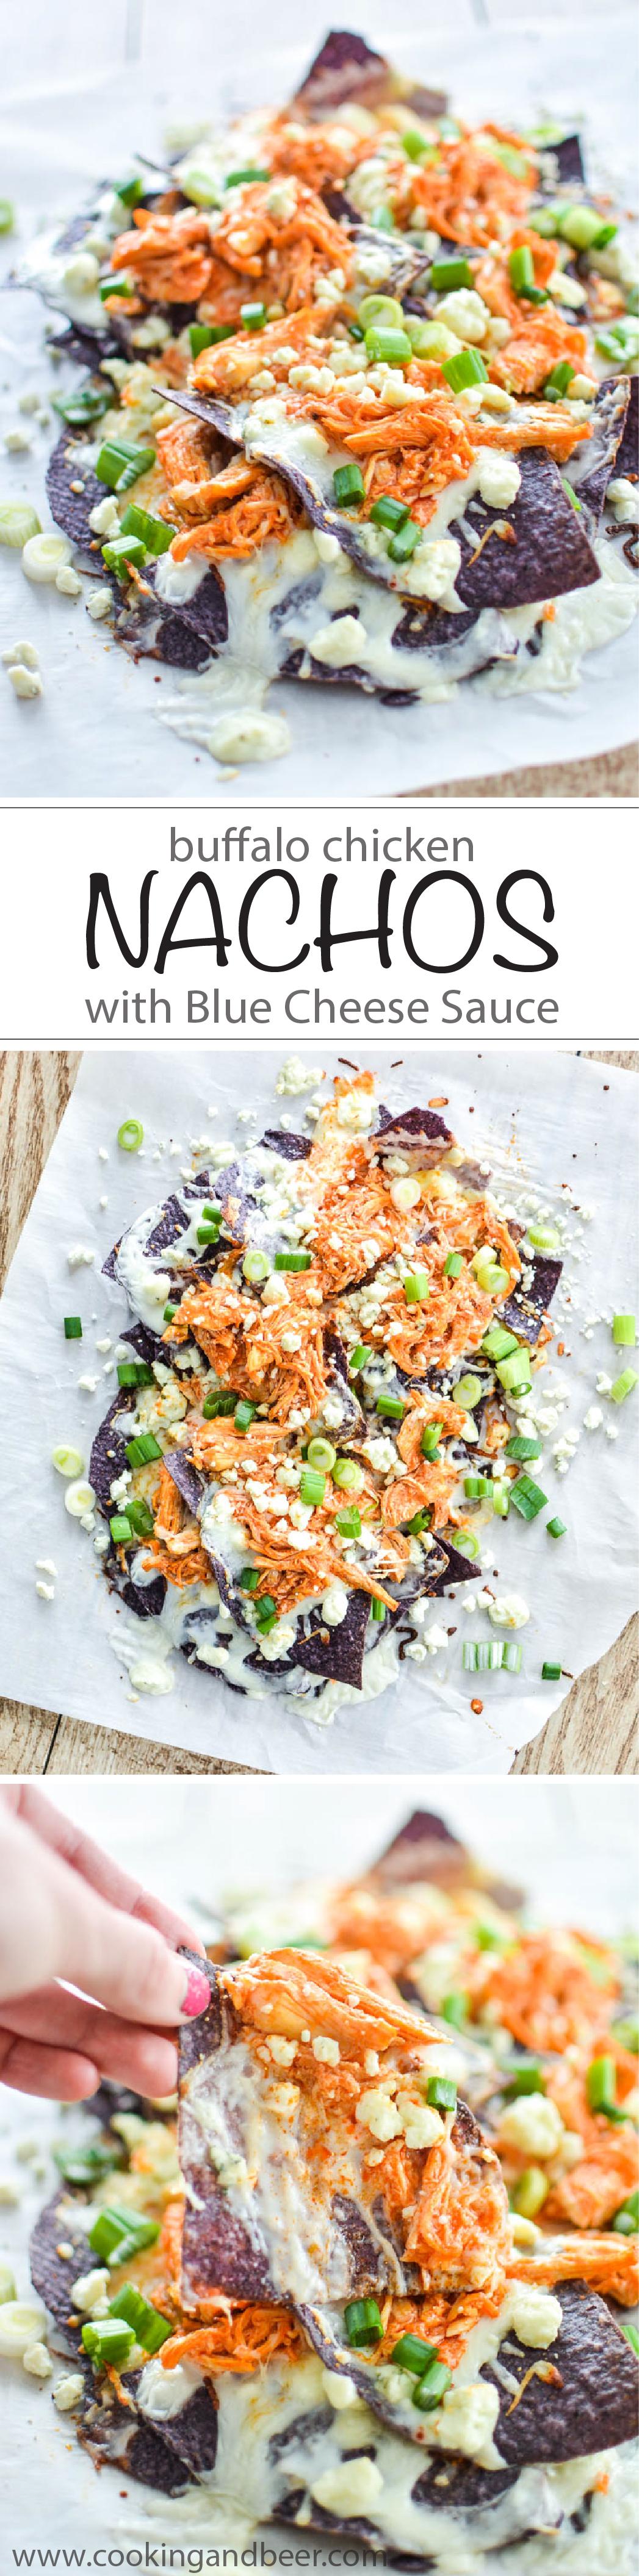 Buffalo Chicken Nachos with Blue Cheese Sauce   www.cookingandbeer.com